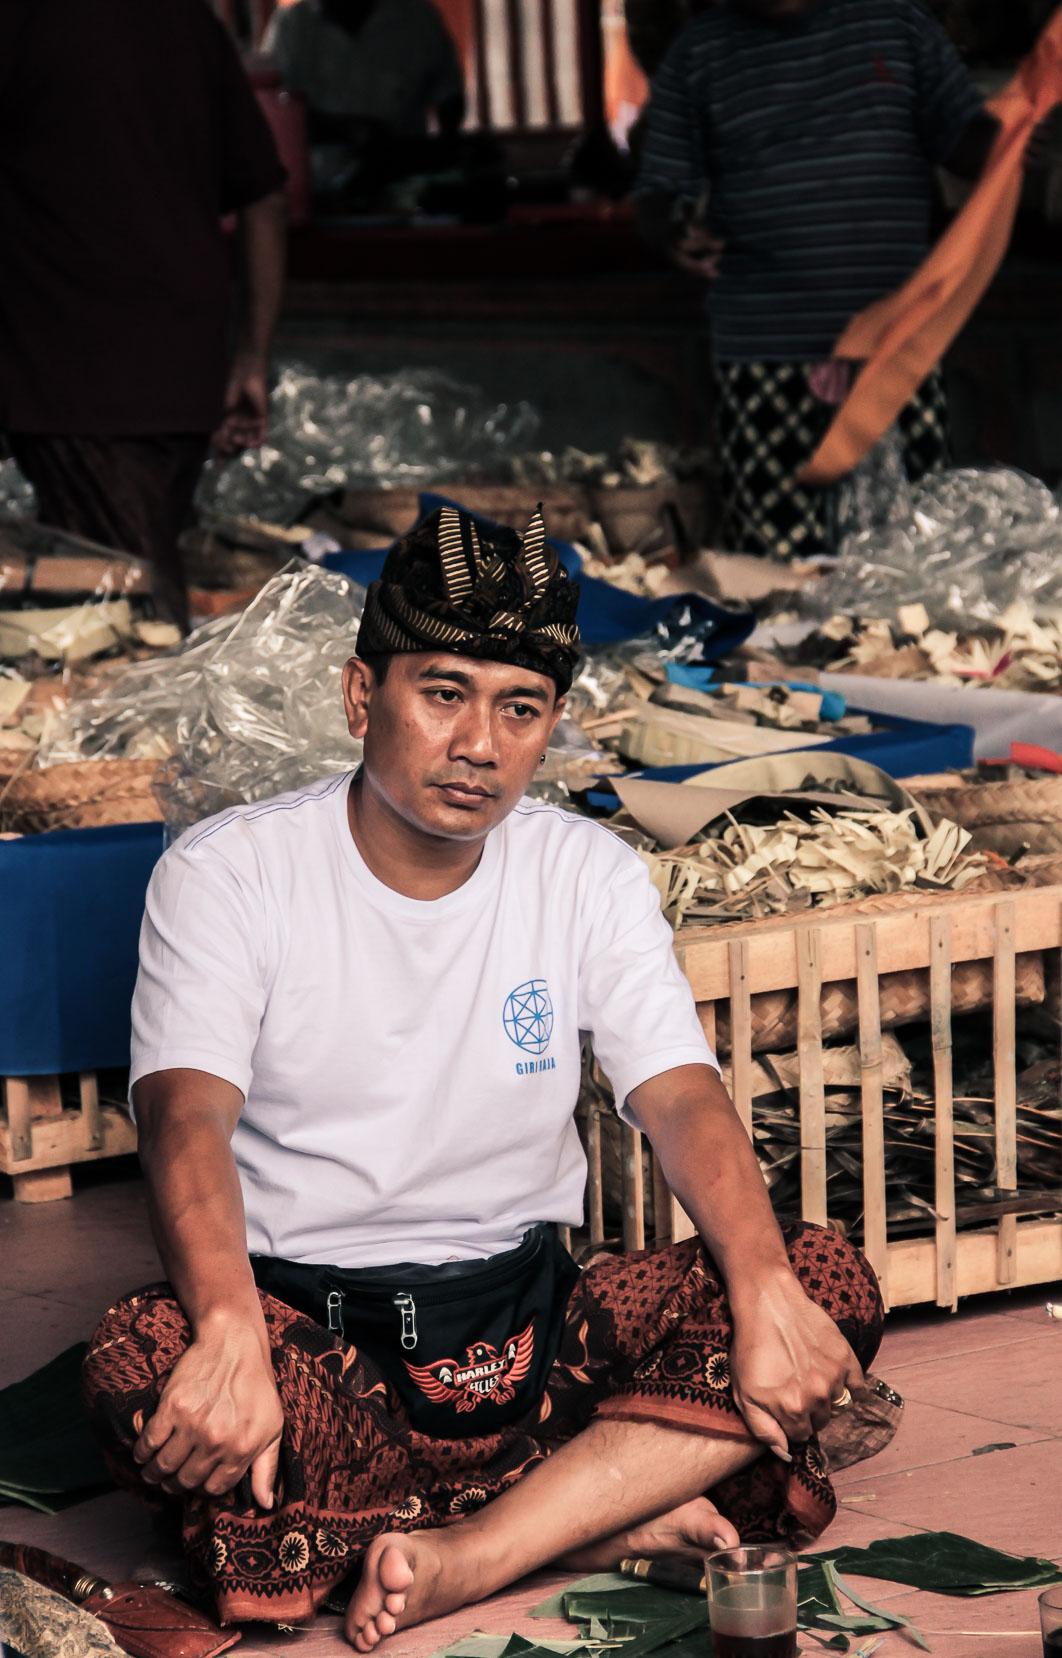 Homme balinais à Ubud